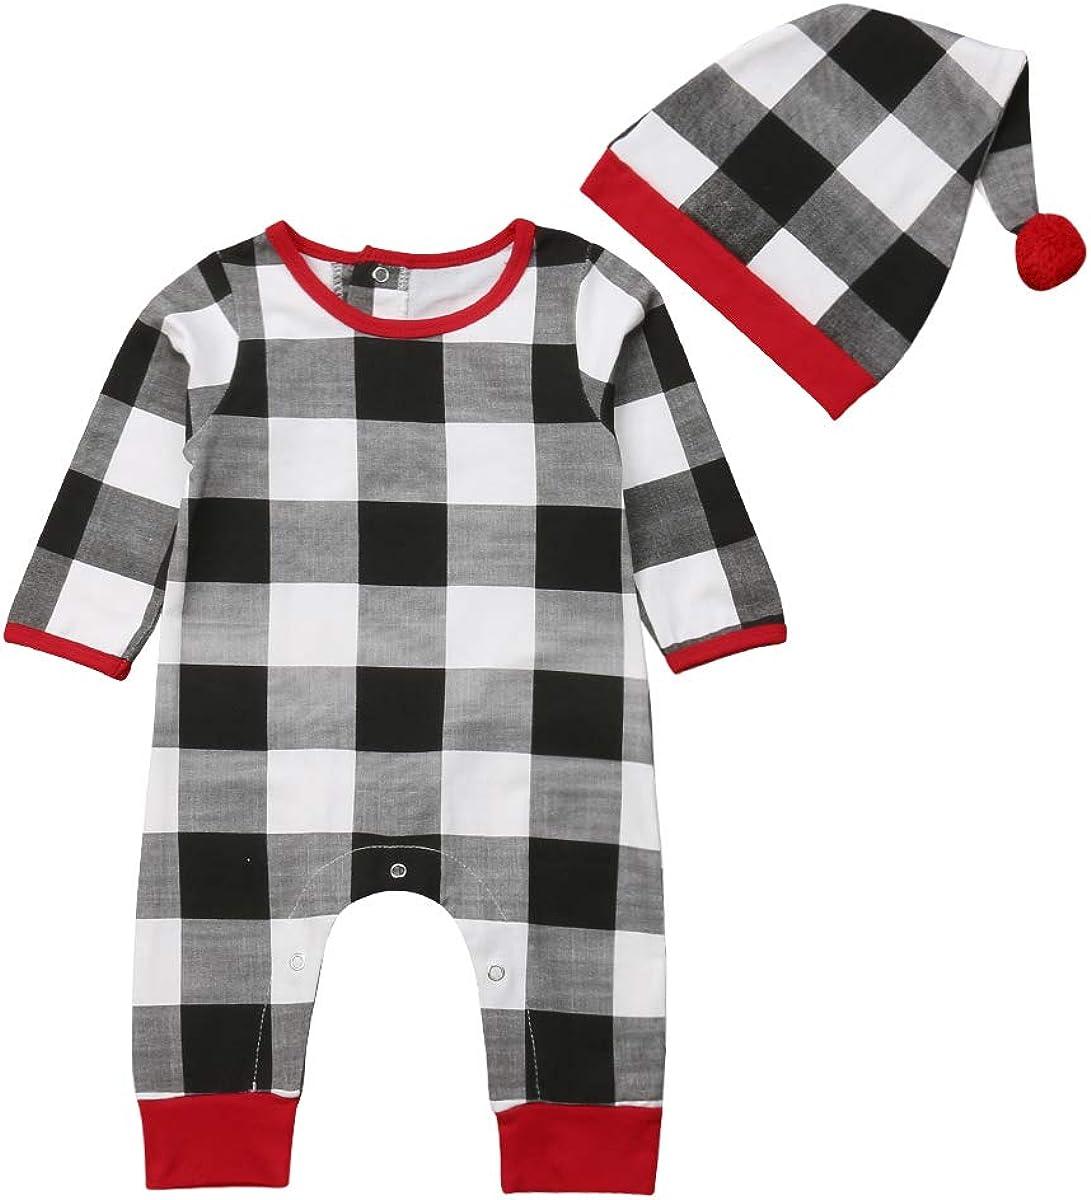 Newborn Baby Girls Boys Christmas Outfits Long Sleeve Plaid Romper Bodysuit Xmas Jumpsuit Pajamas Hat Set 0-24M